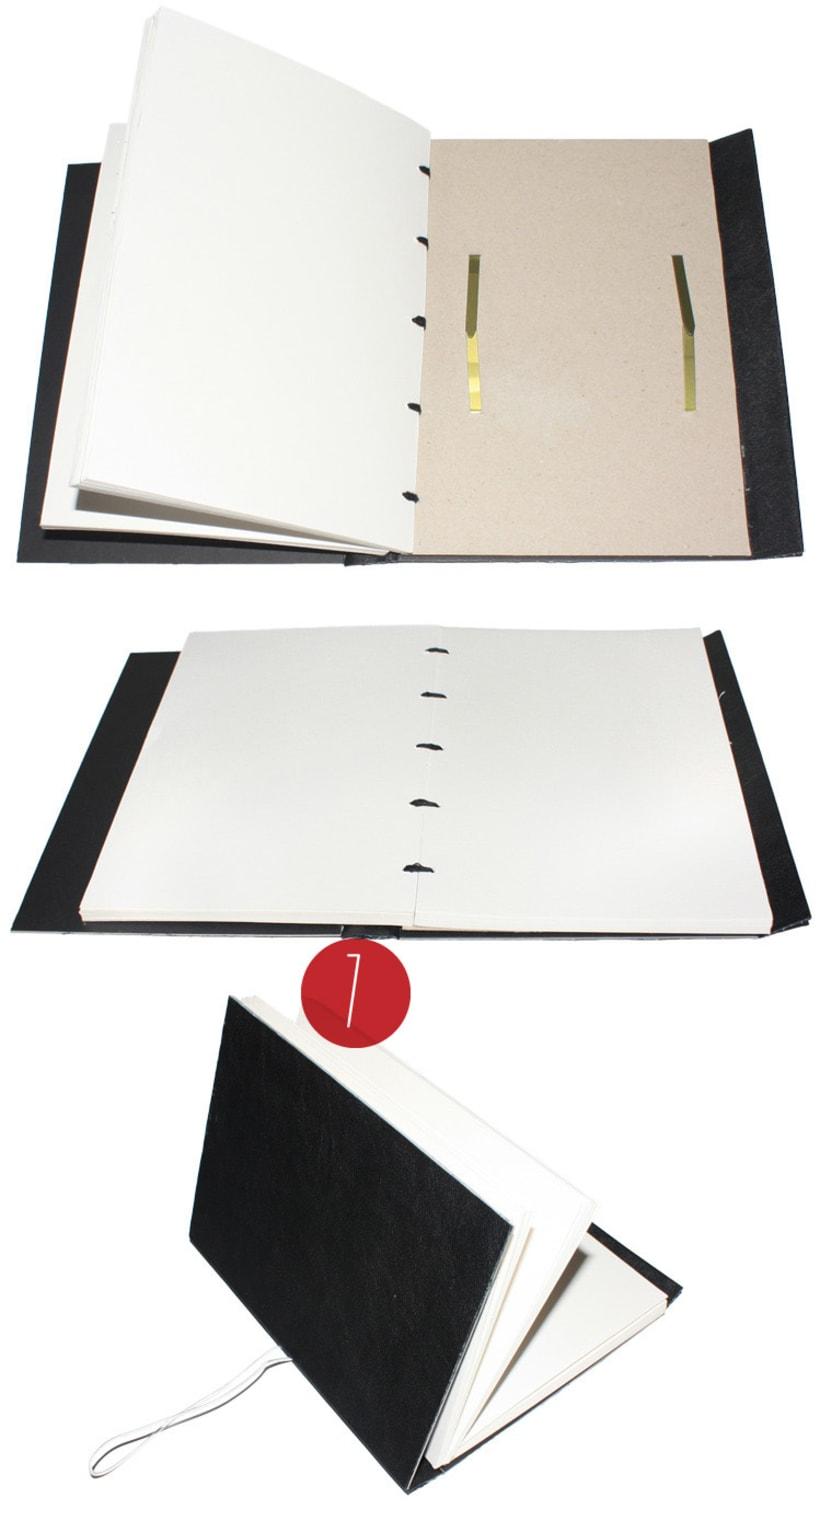 Hecho a mano - miSketchbook 14